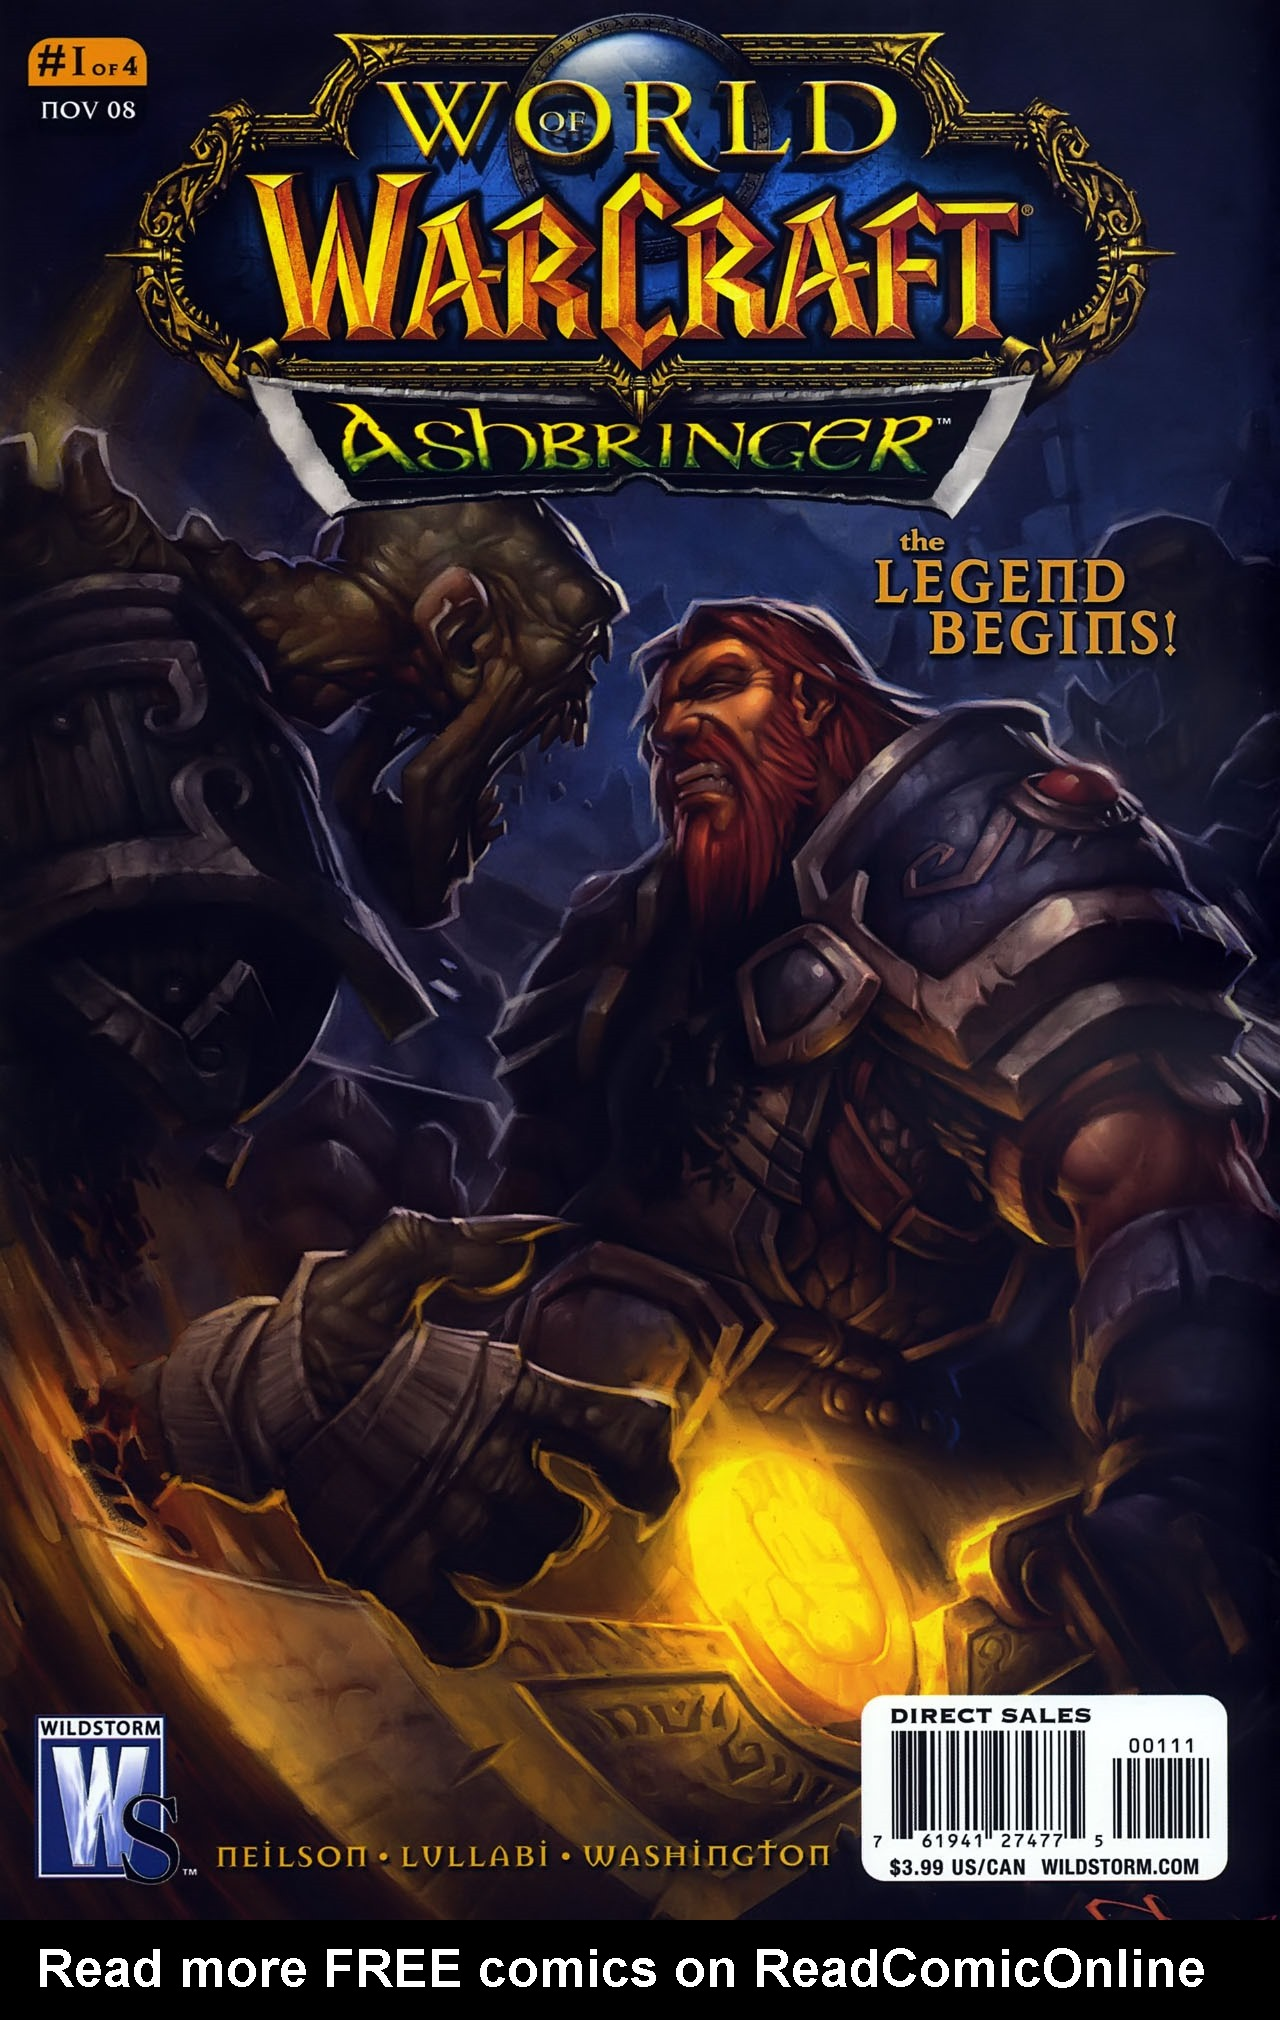 Read online World of Warcraft: Ashbringer comic -  Issue #1 - 1